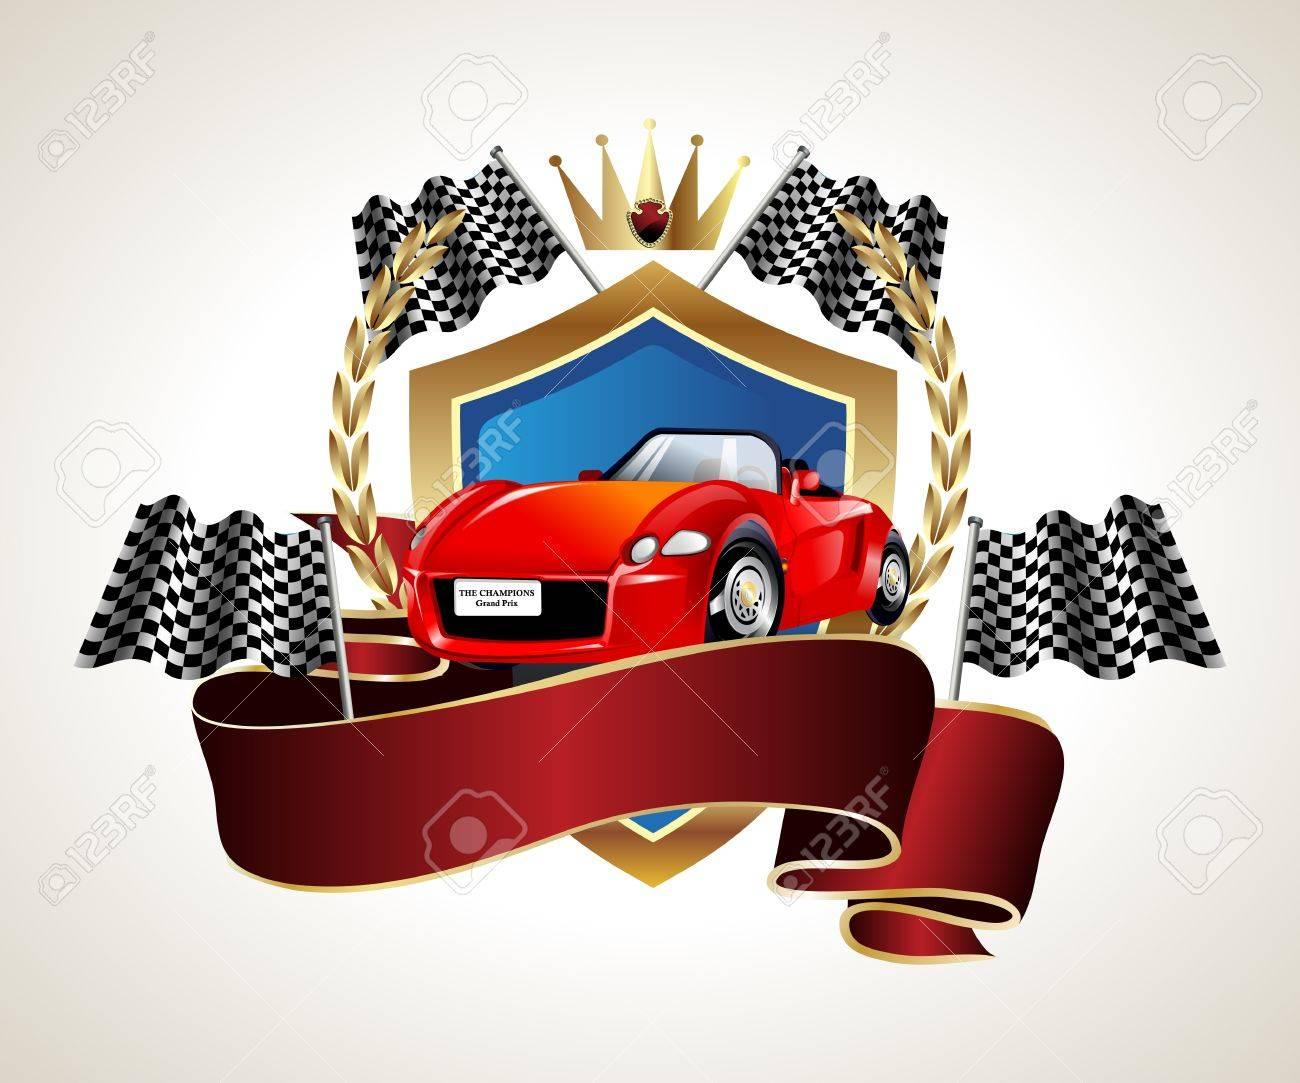 emblem car racing championship Stock Vector - 12476796